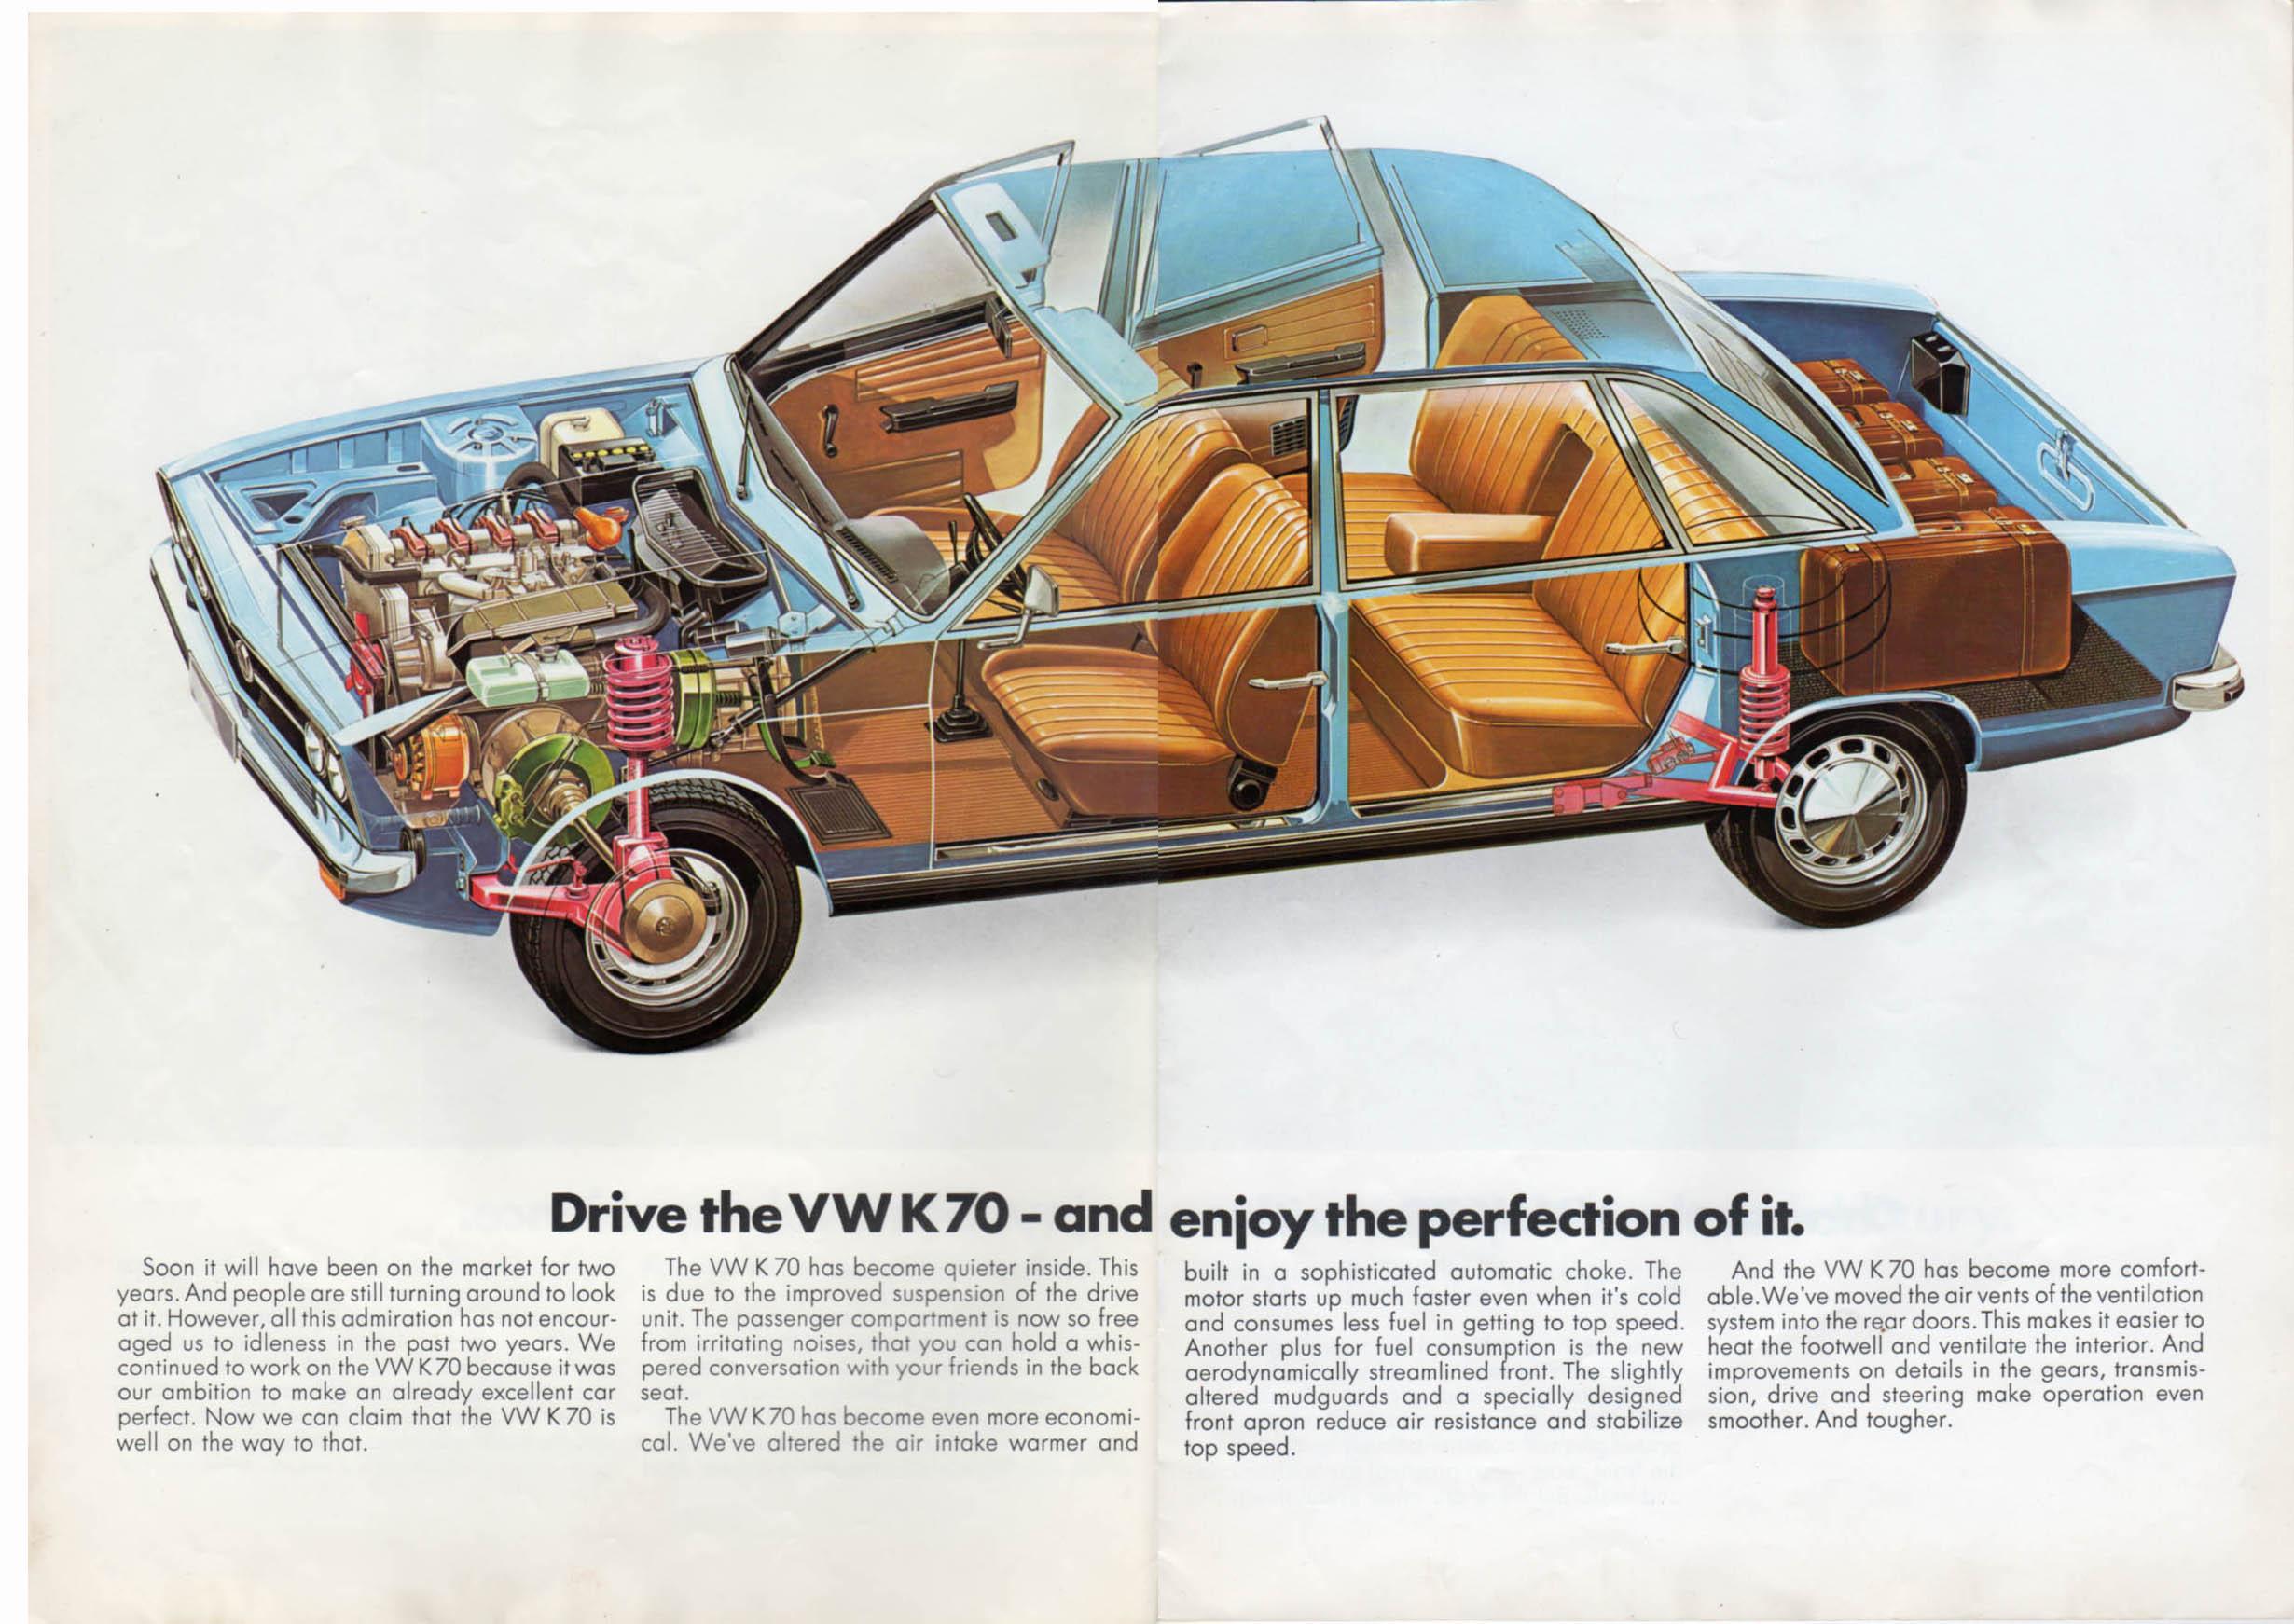 TheSamba.com :: VW Archives - 1973 VW K70 Brochure